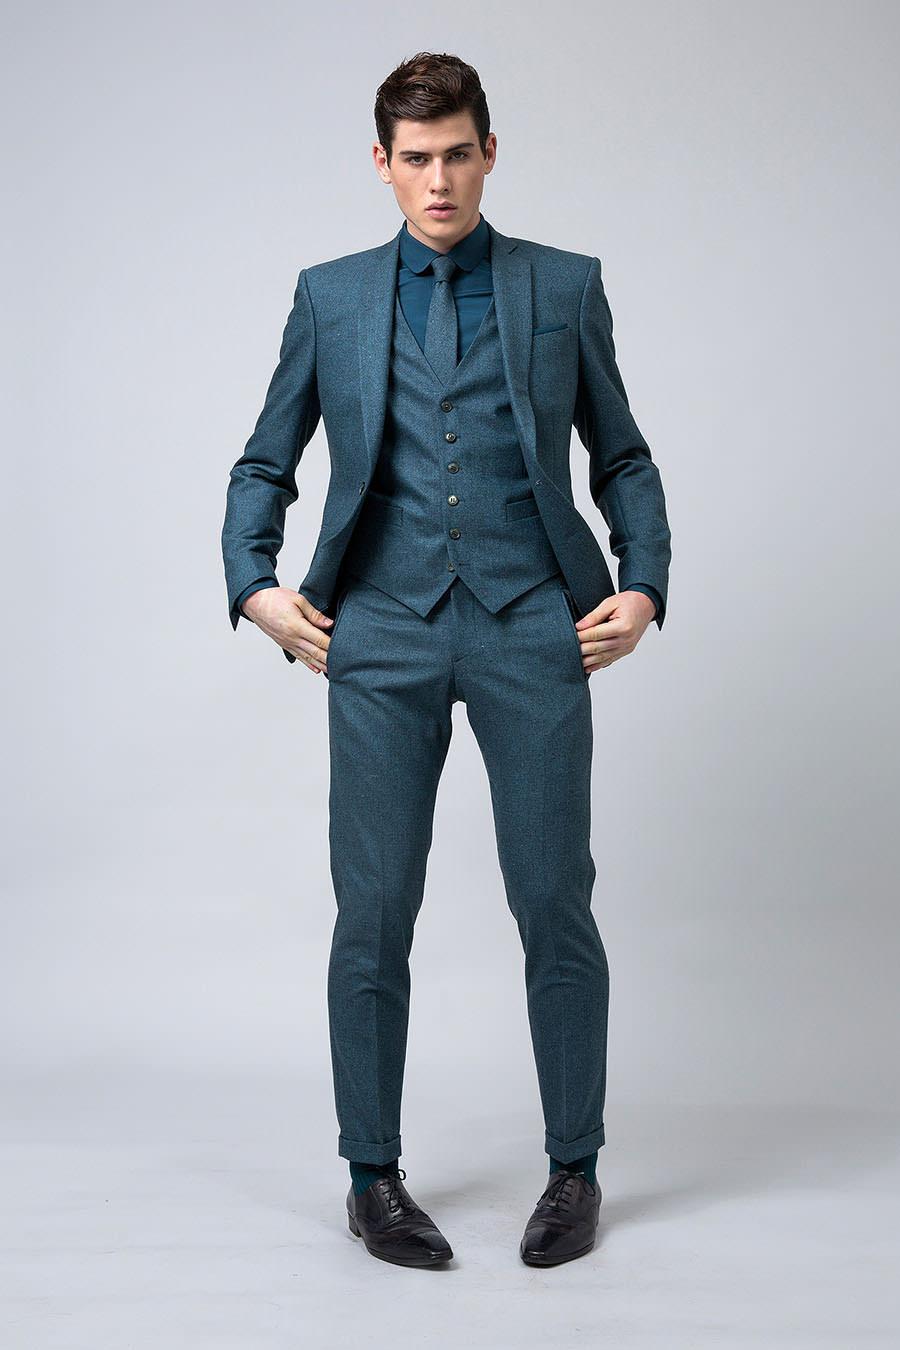 samonsurmesureH16 costume bleu canard-2